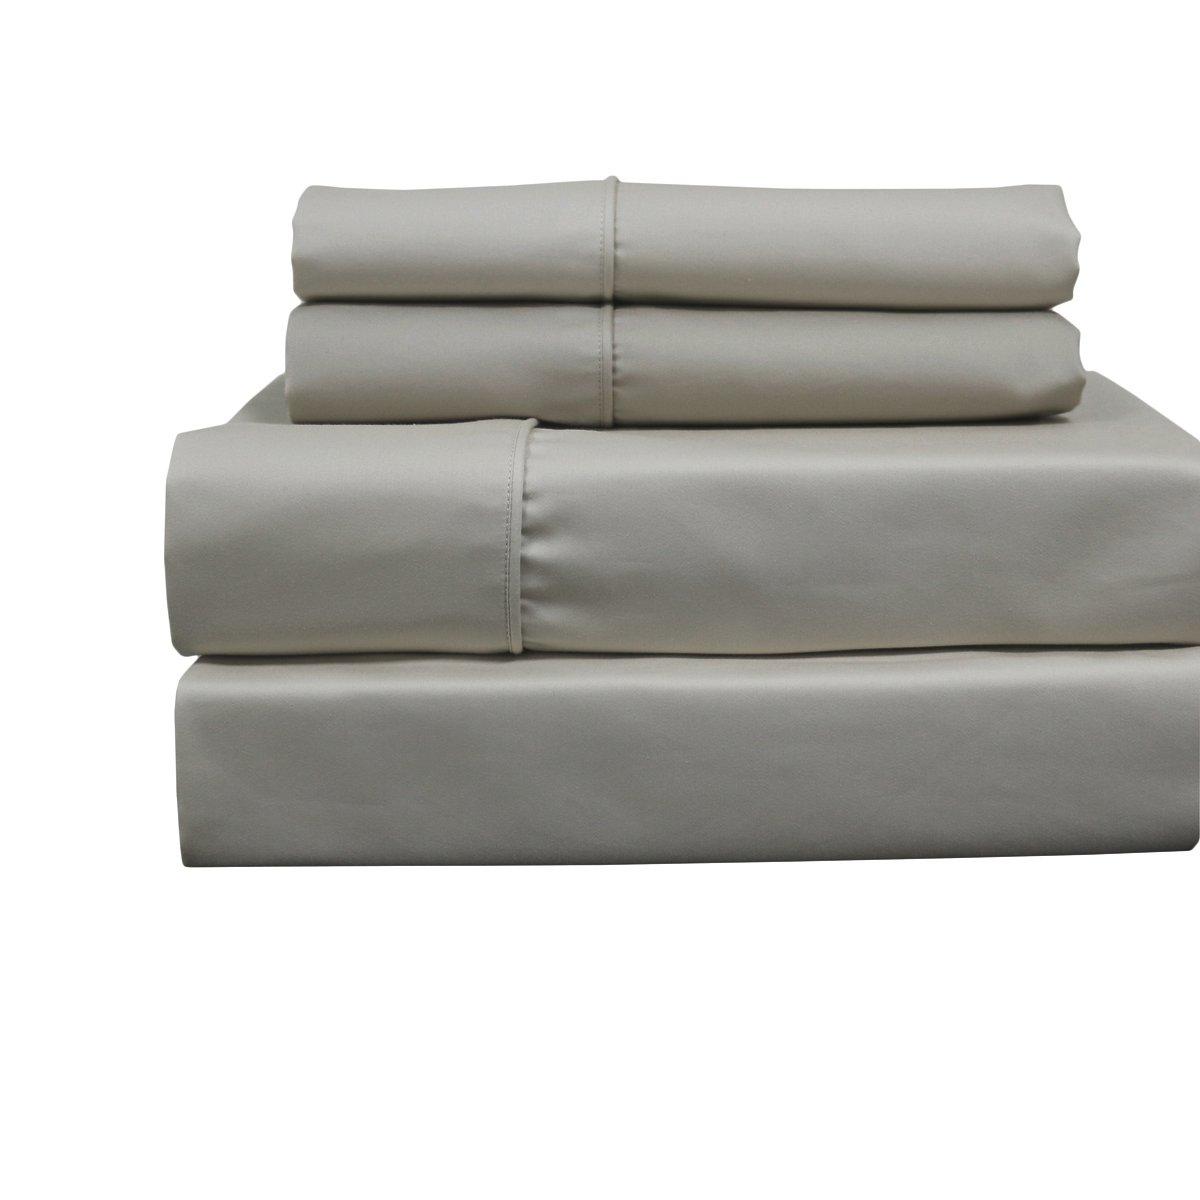 Solid Linen Top Split King: Adjustable King Bed Size Sheets, 4PC Bed Sheet Set, Cotton blend 650 Thread Count, Sateen Solid, Deep Pocket